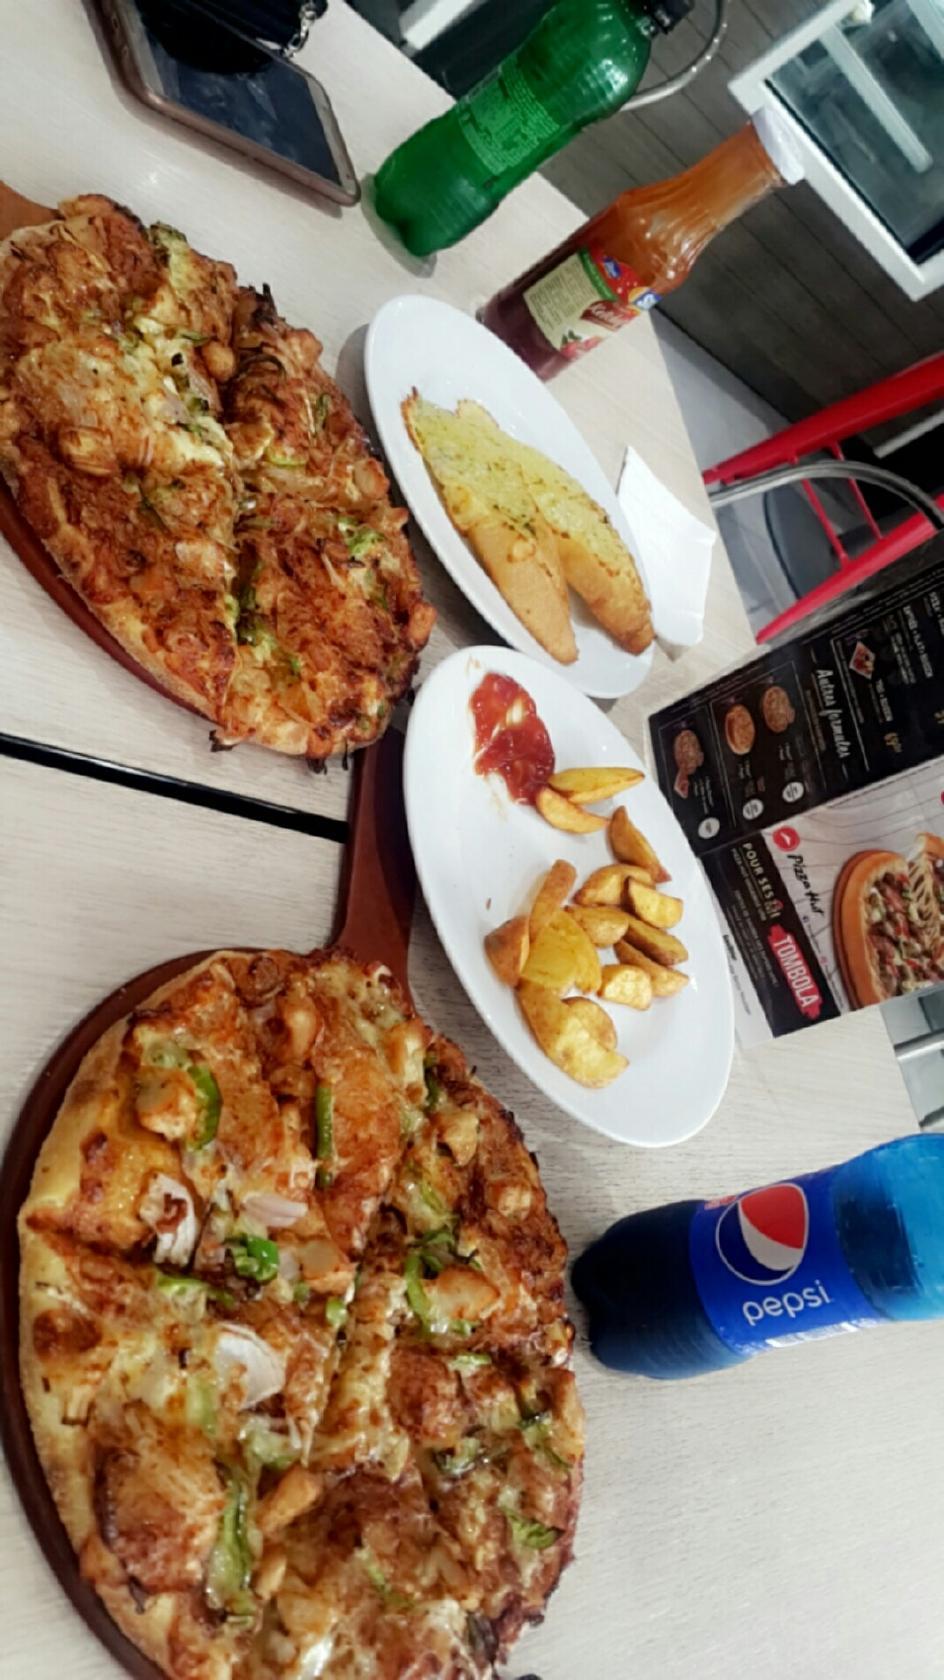 Pizza Hut Delivery Pizzeria Casablanca Angle Rue Taha Houcine